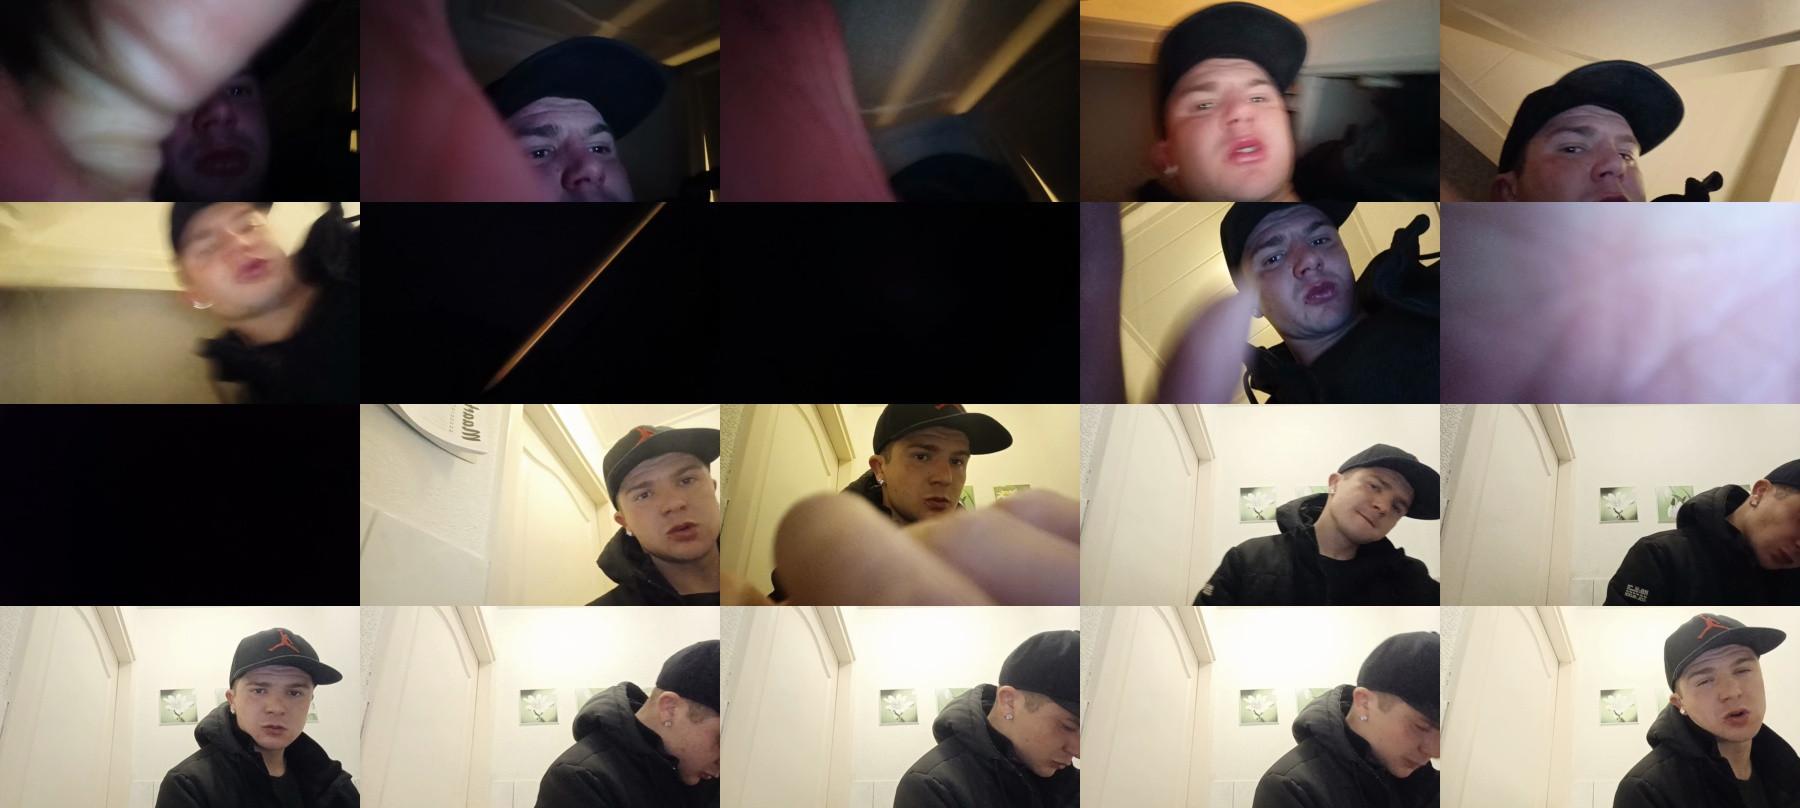 Markjanssen1996 Cam4 03-03-2021 Recorded Video Porn